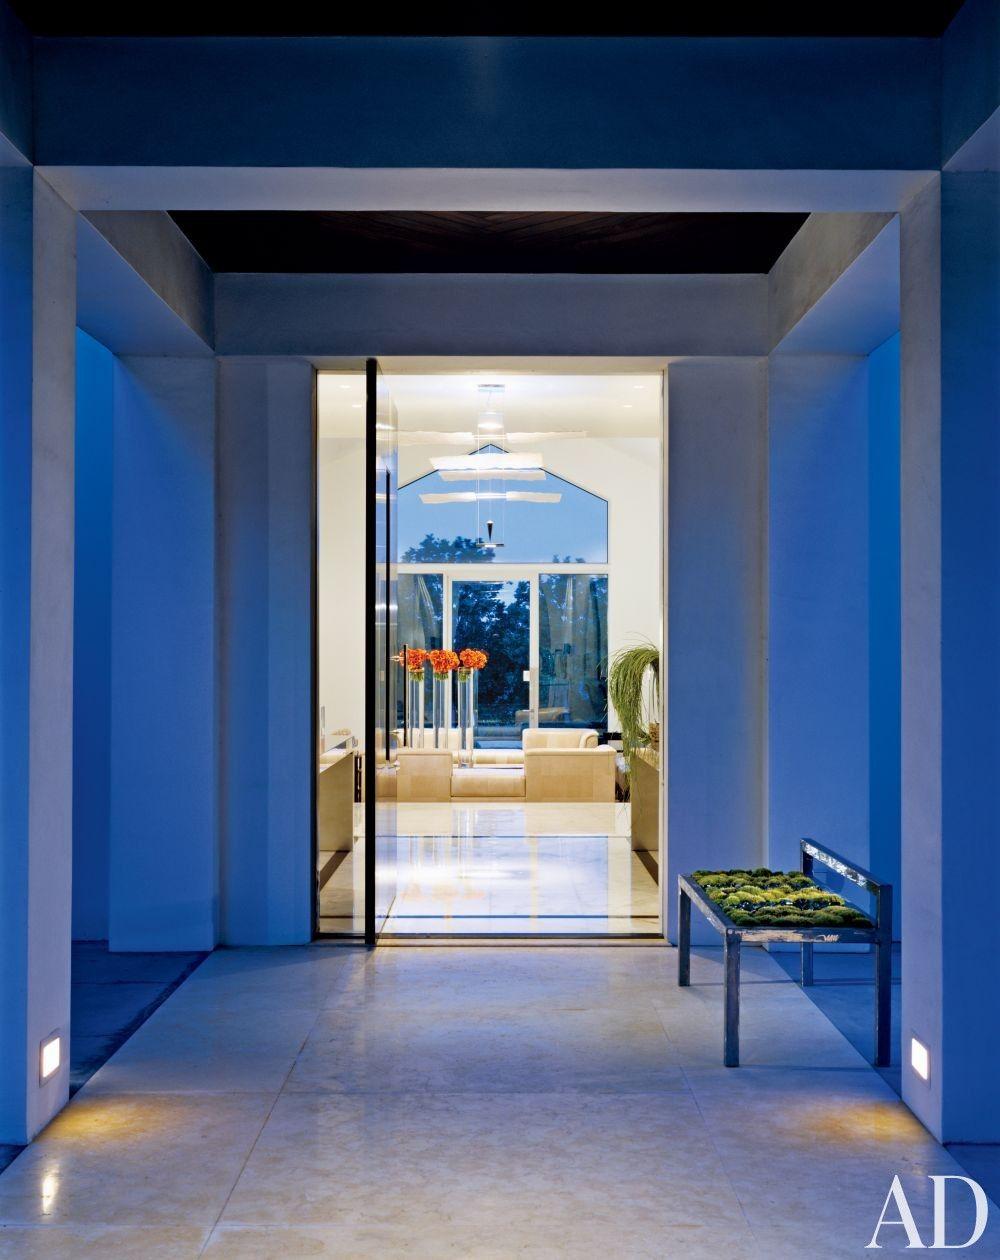 Contemporary entrance hall by jennifer post design inc and jennifer post design inc in los angeles california